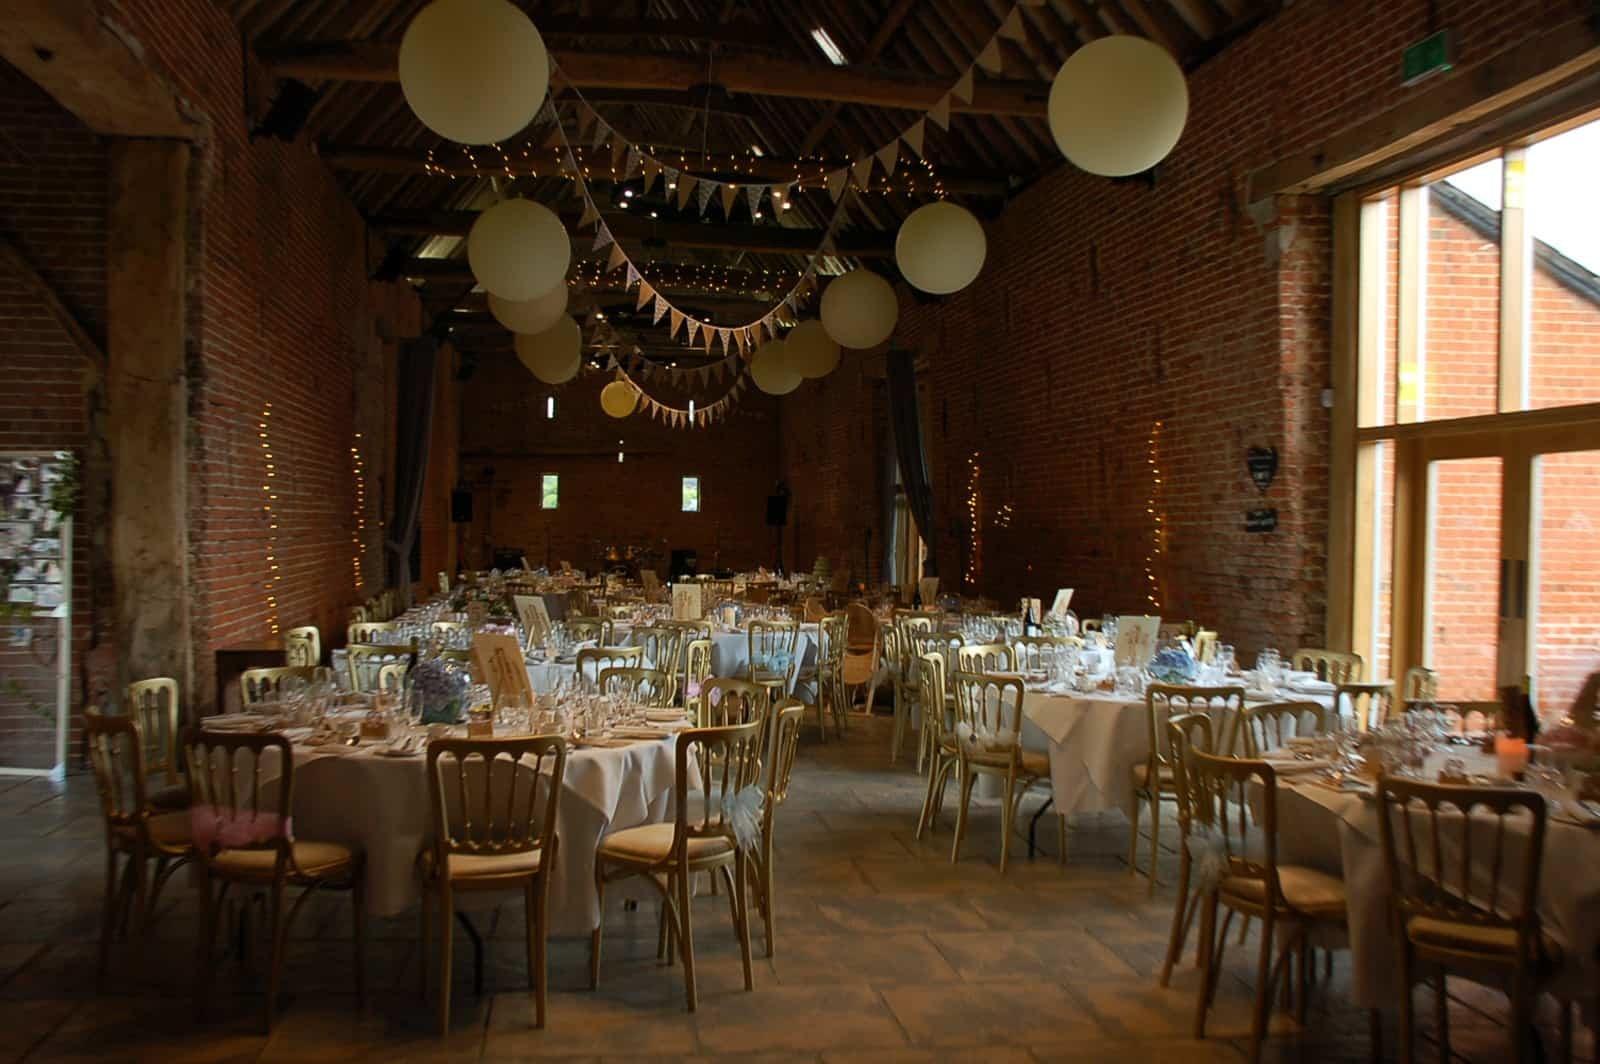 Copdock Hall barn inside